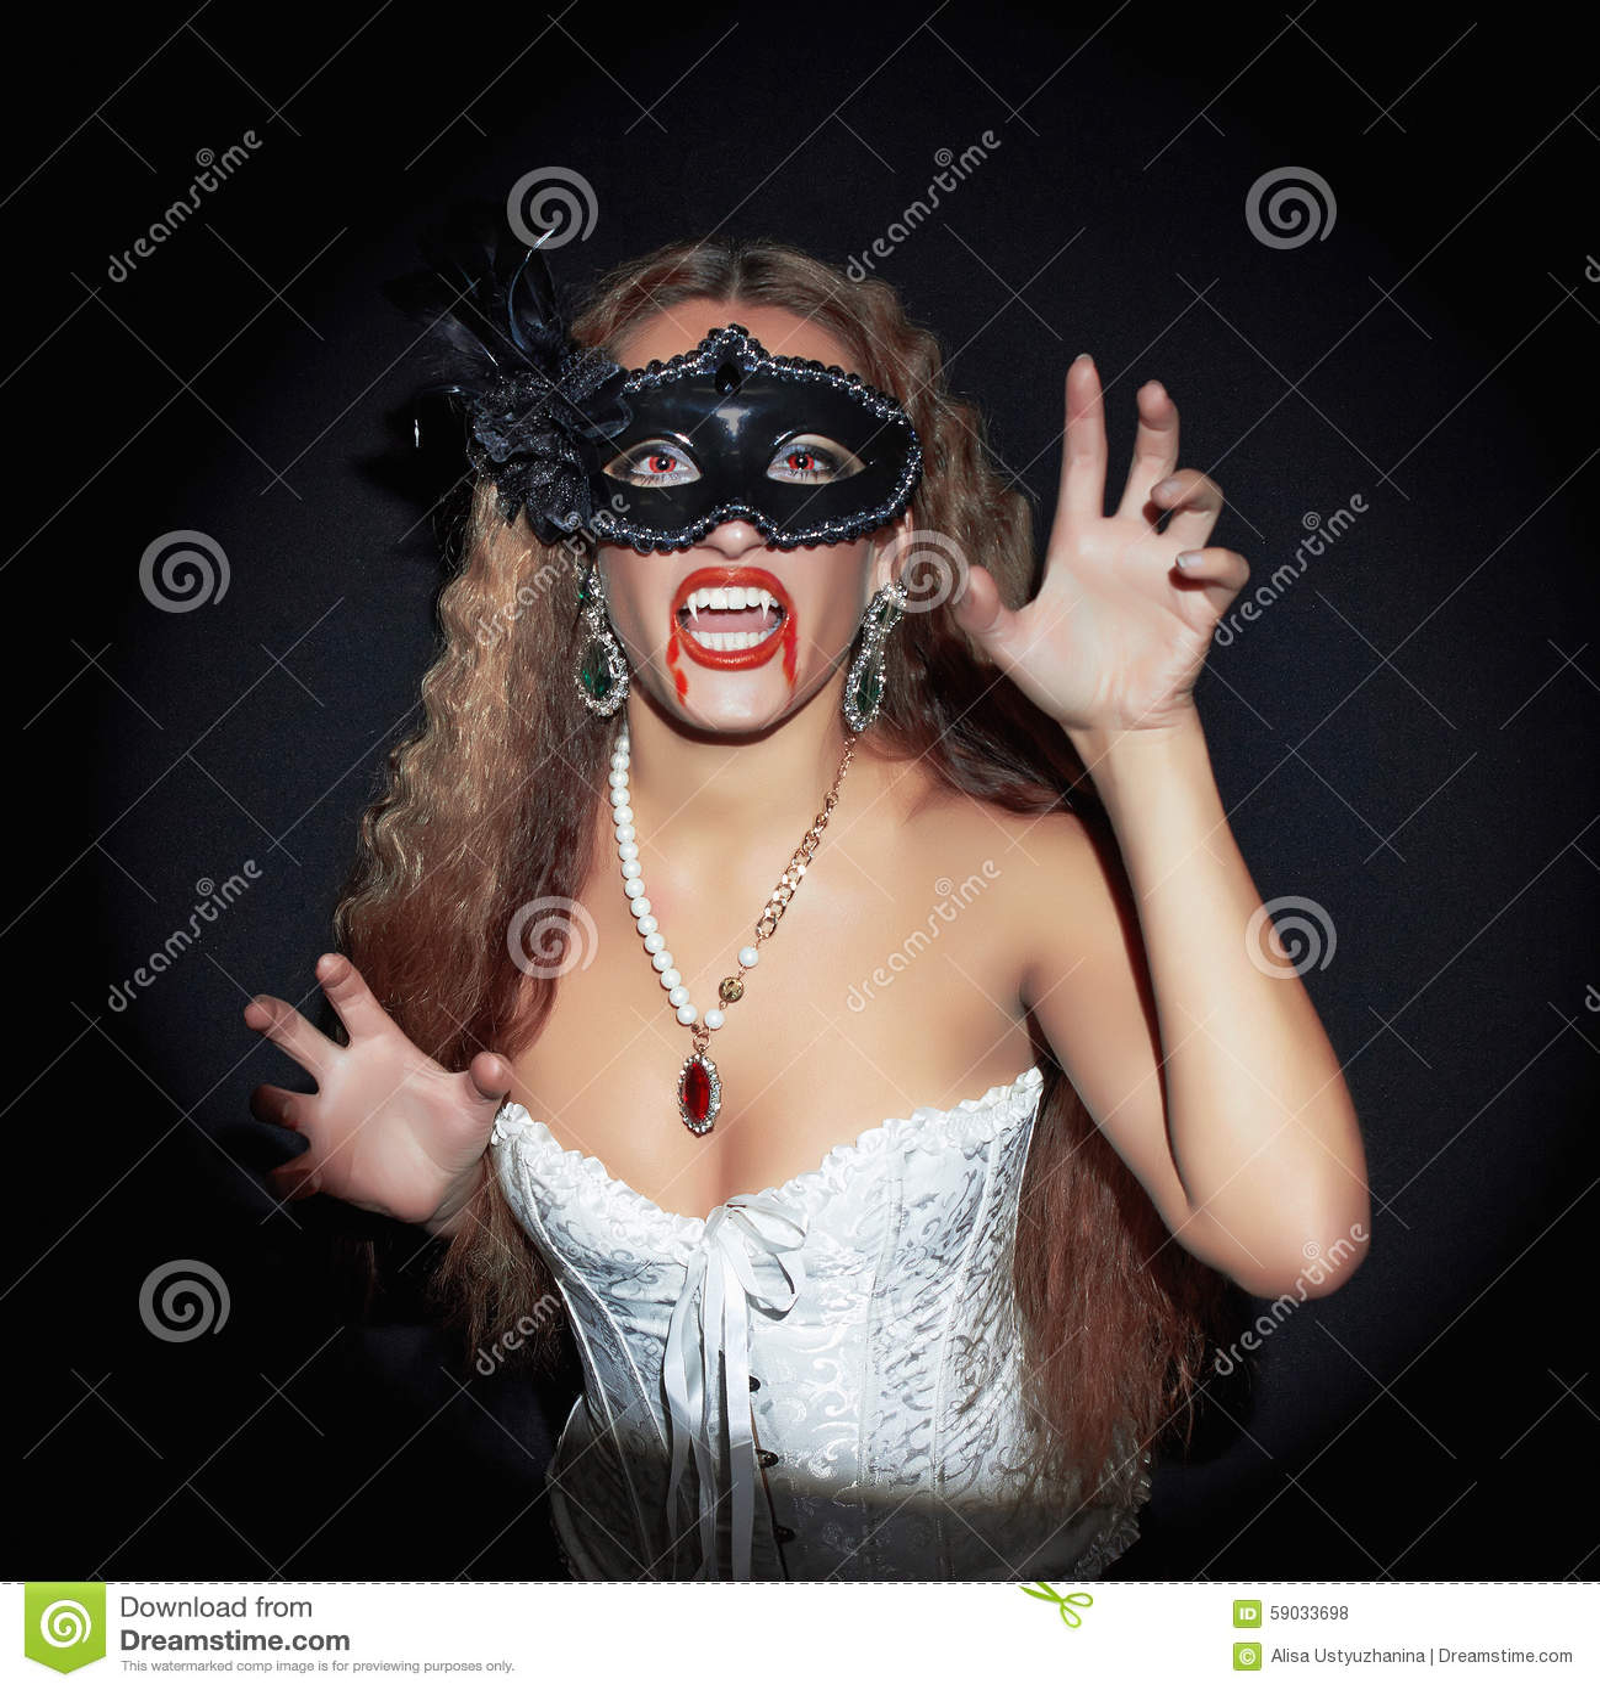 Halloween Vamp Girl In Mask Stock Photo - Image: 59033698